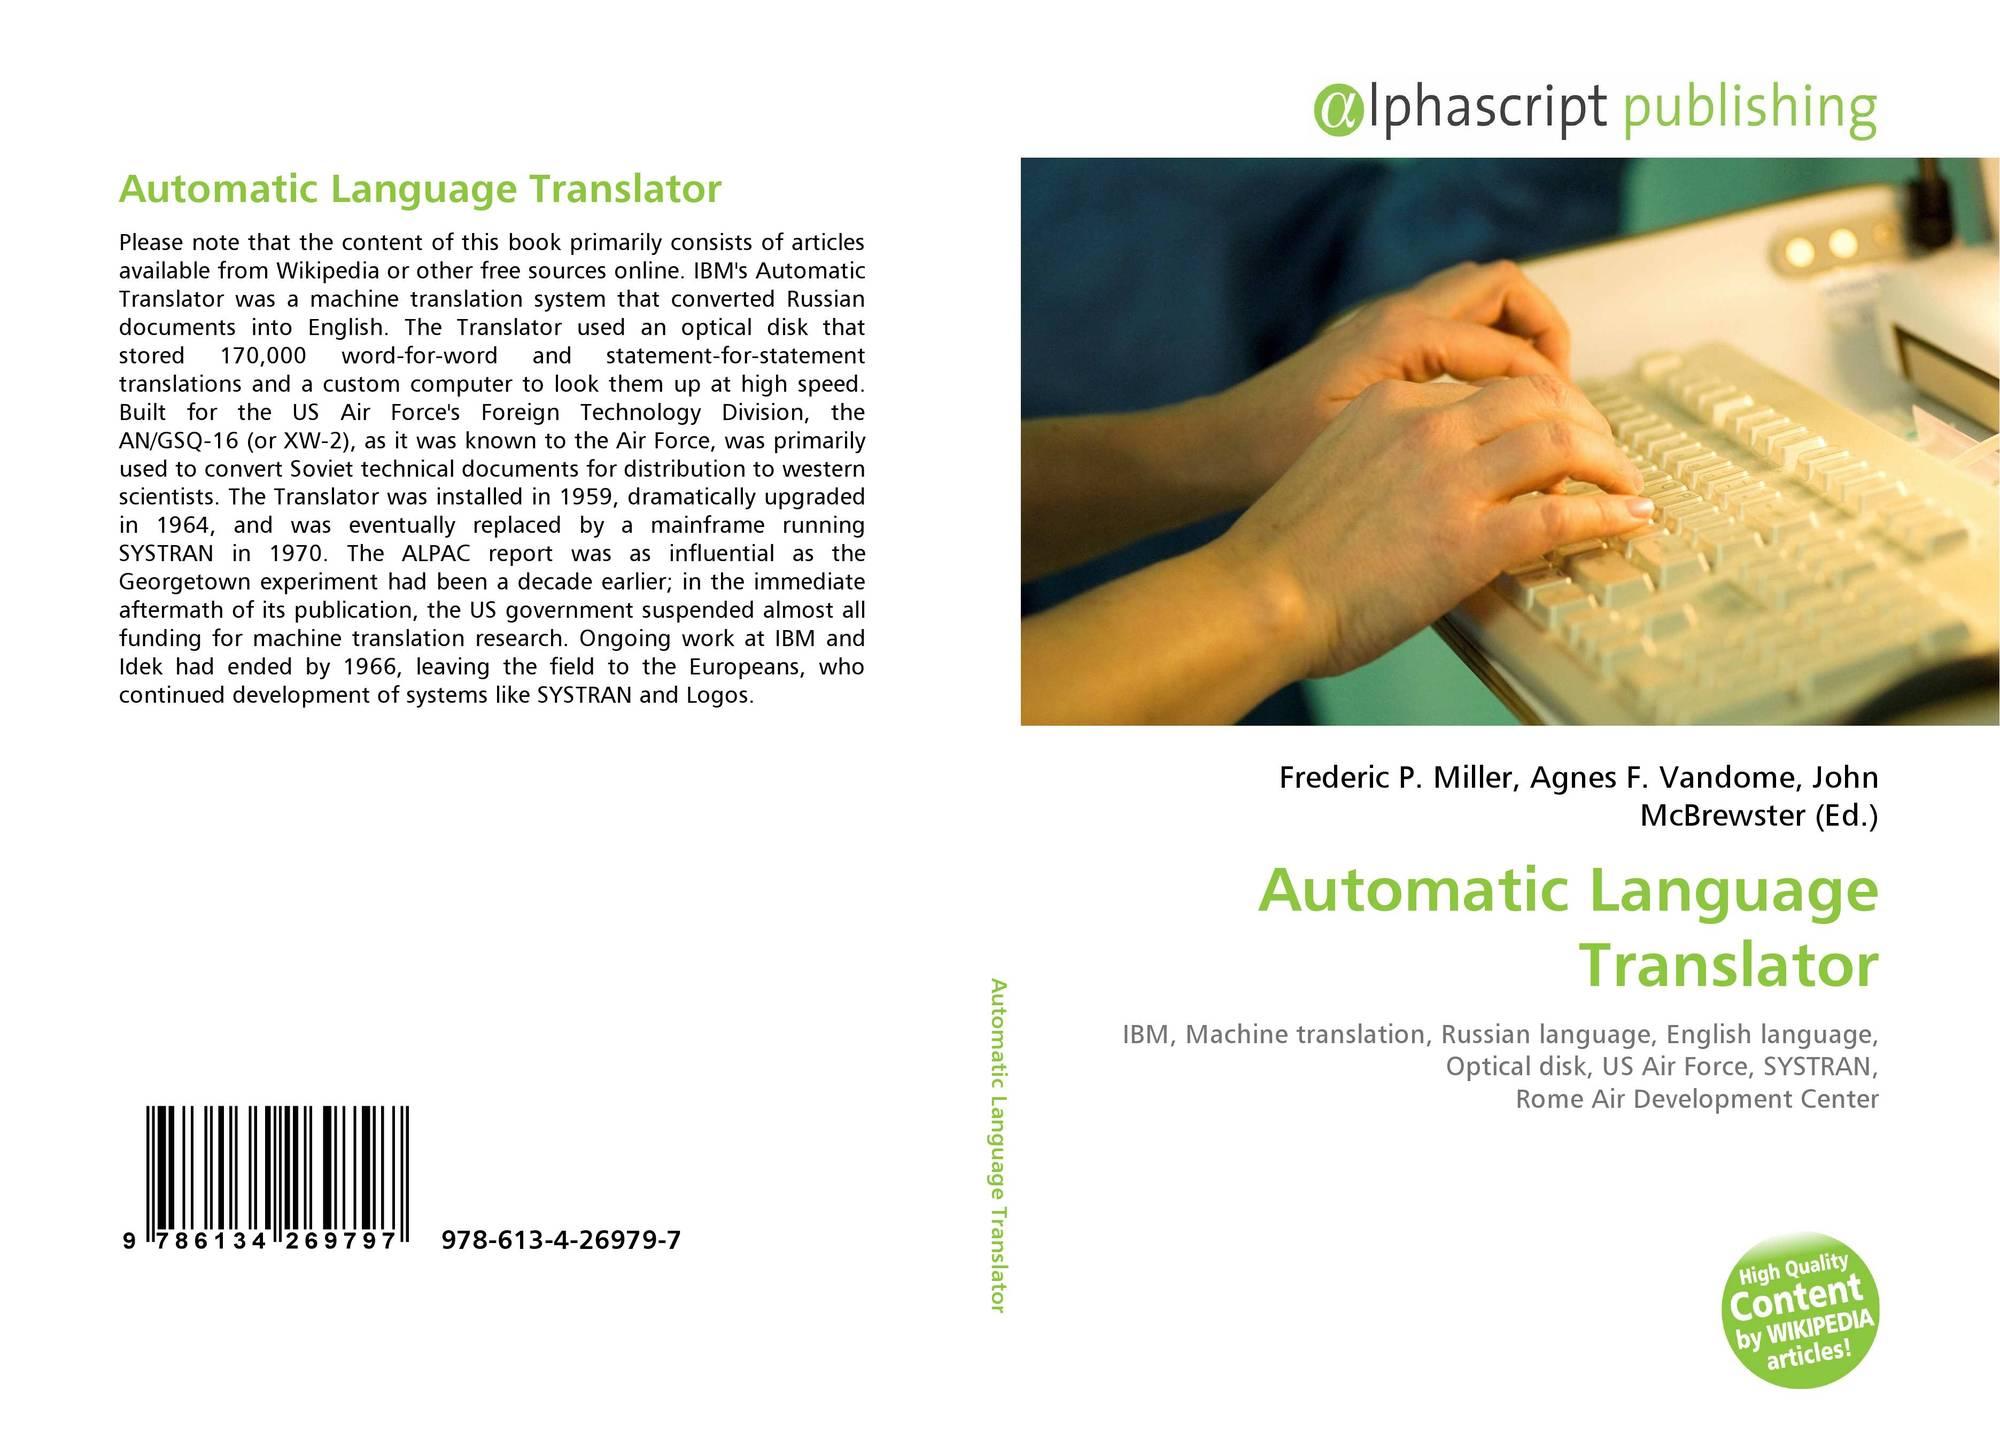 Automatic Language Translator, 978-613-4-26979-7, 6134269794